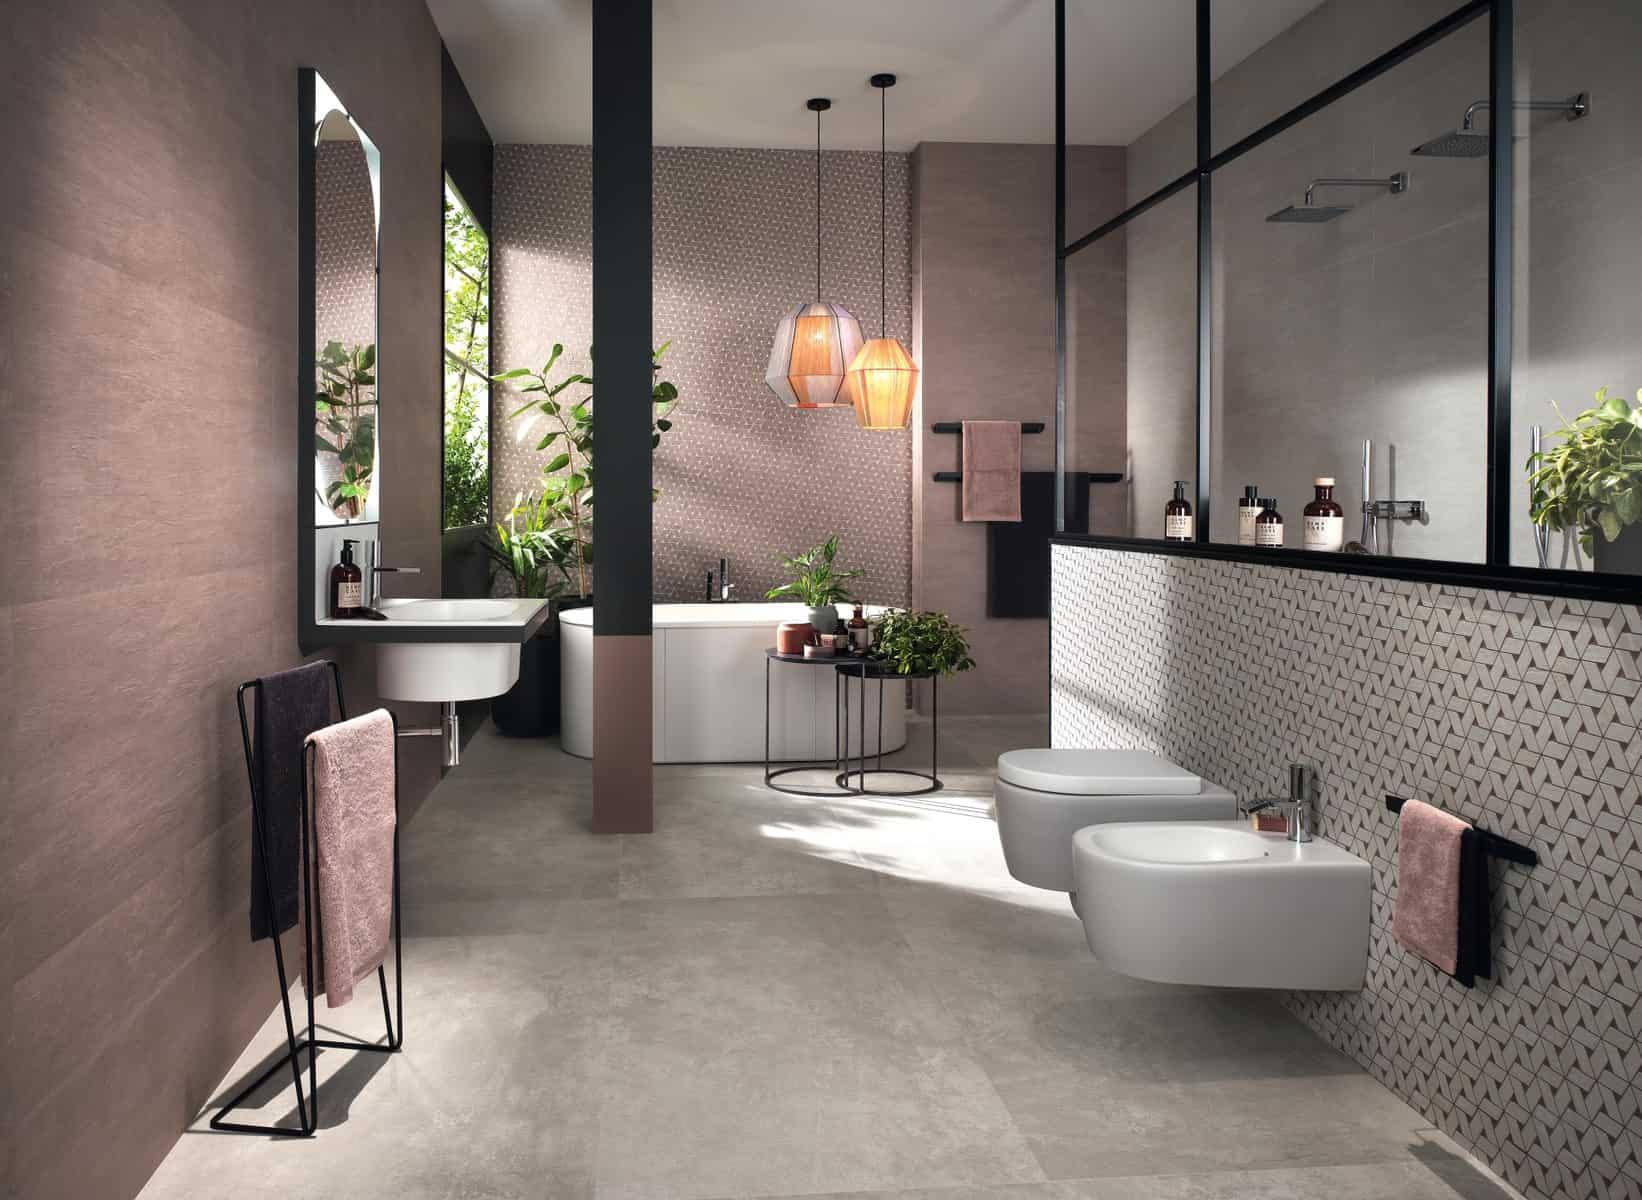 Staroružová kúpeľňa